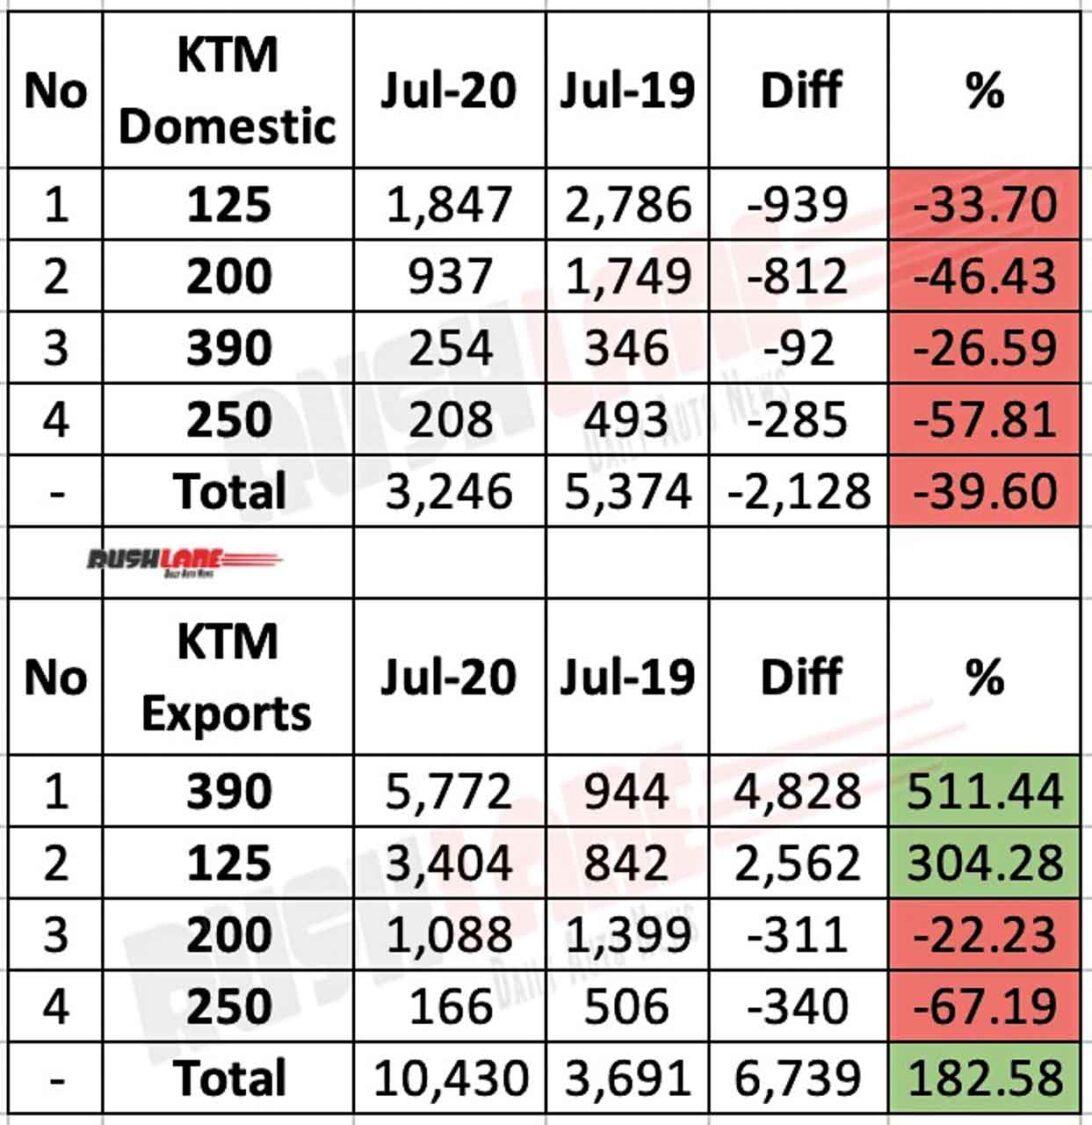 KTM India sales, exports - July 2020